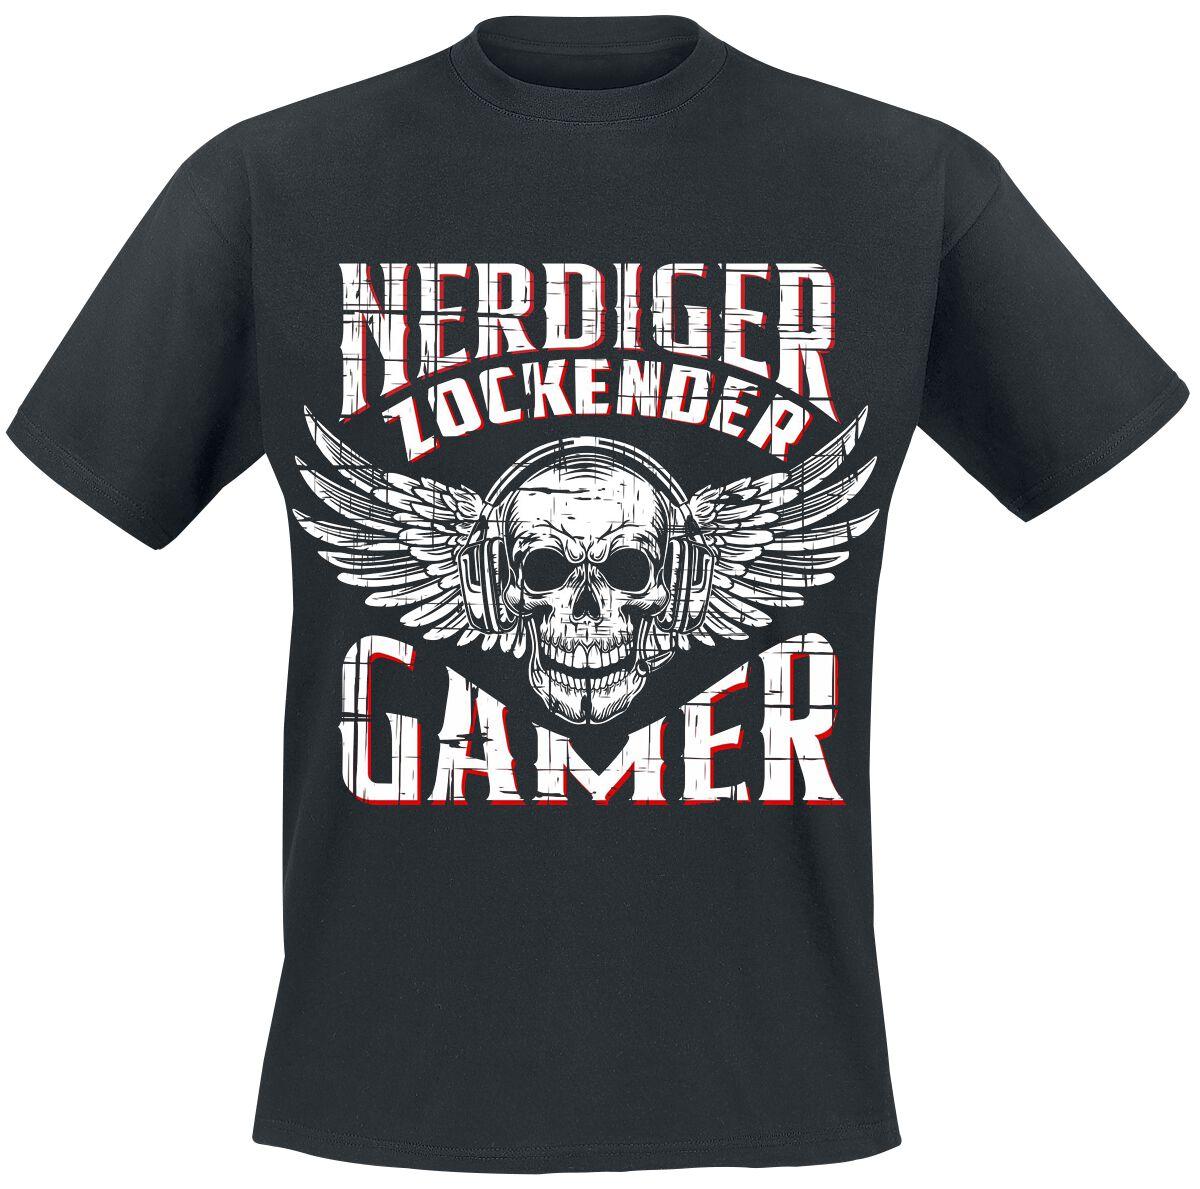 Nerdiger Zockender Gamer Nerdiger Zockender Gamer T-Shirt schwarz POD - Nerdiger zockender gamer - Gildan